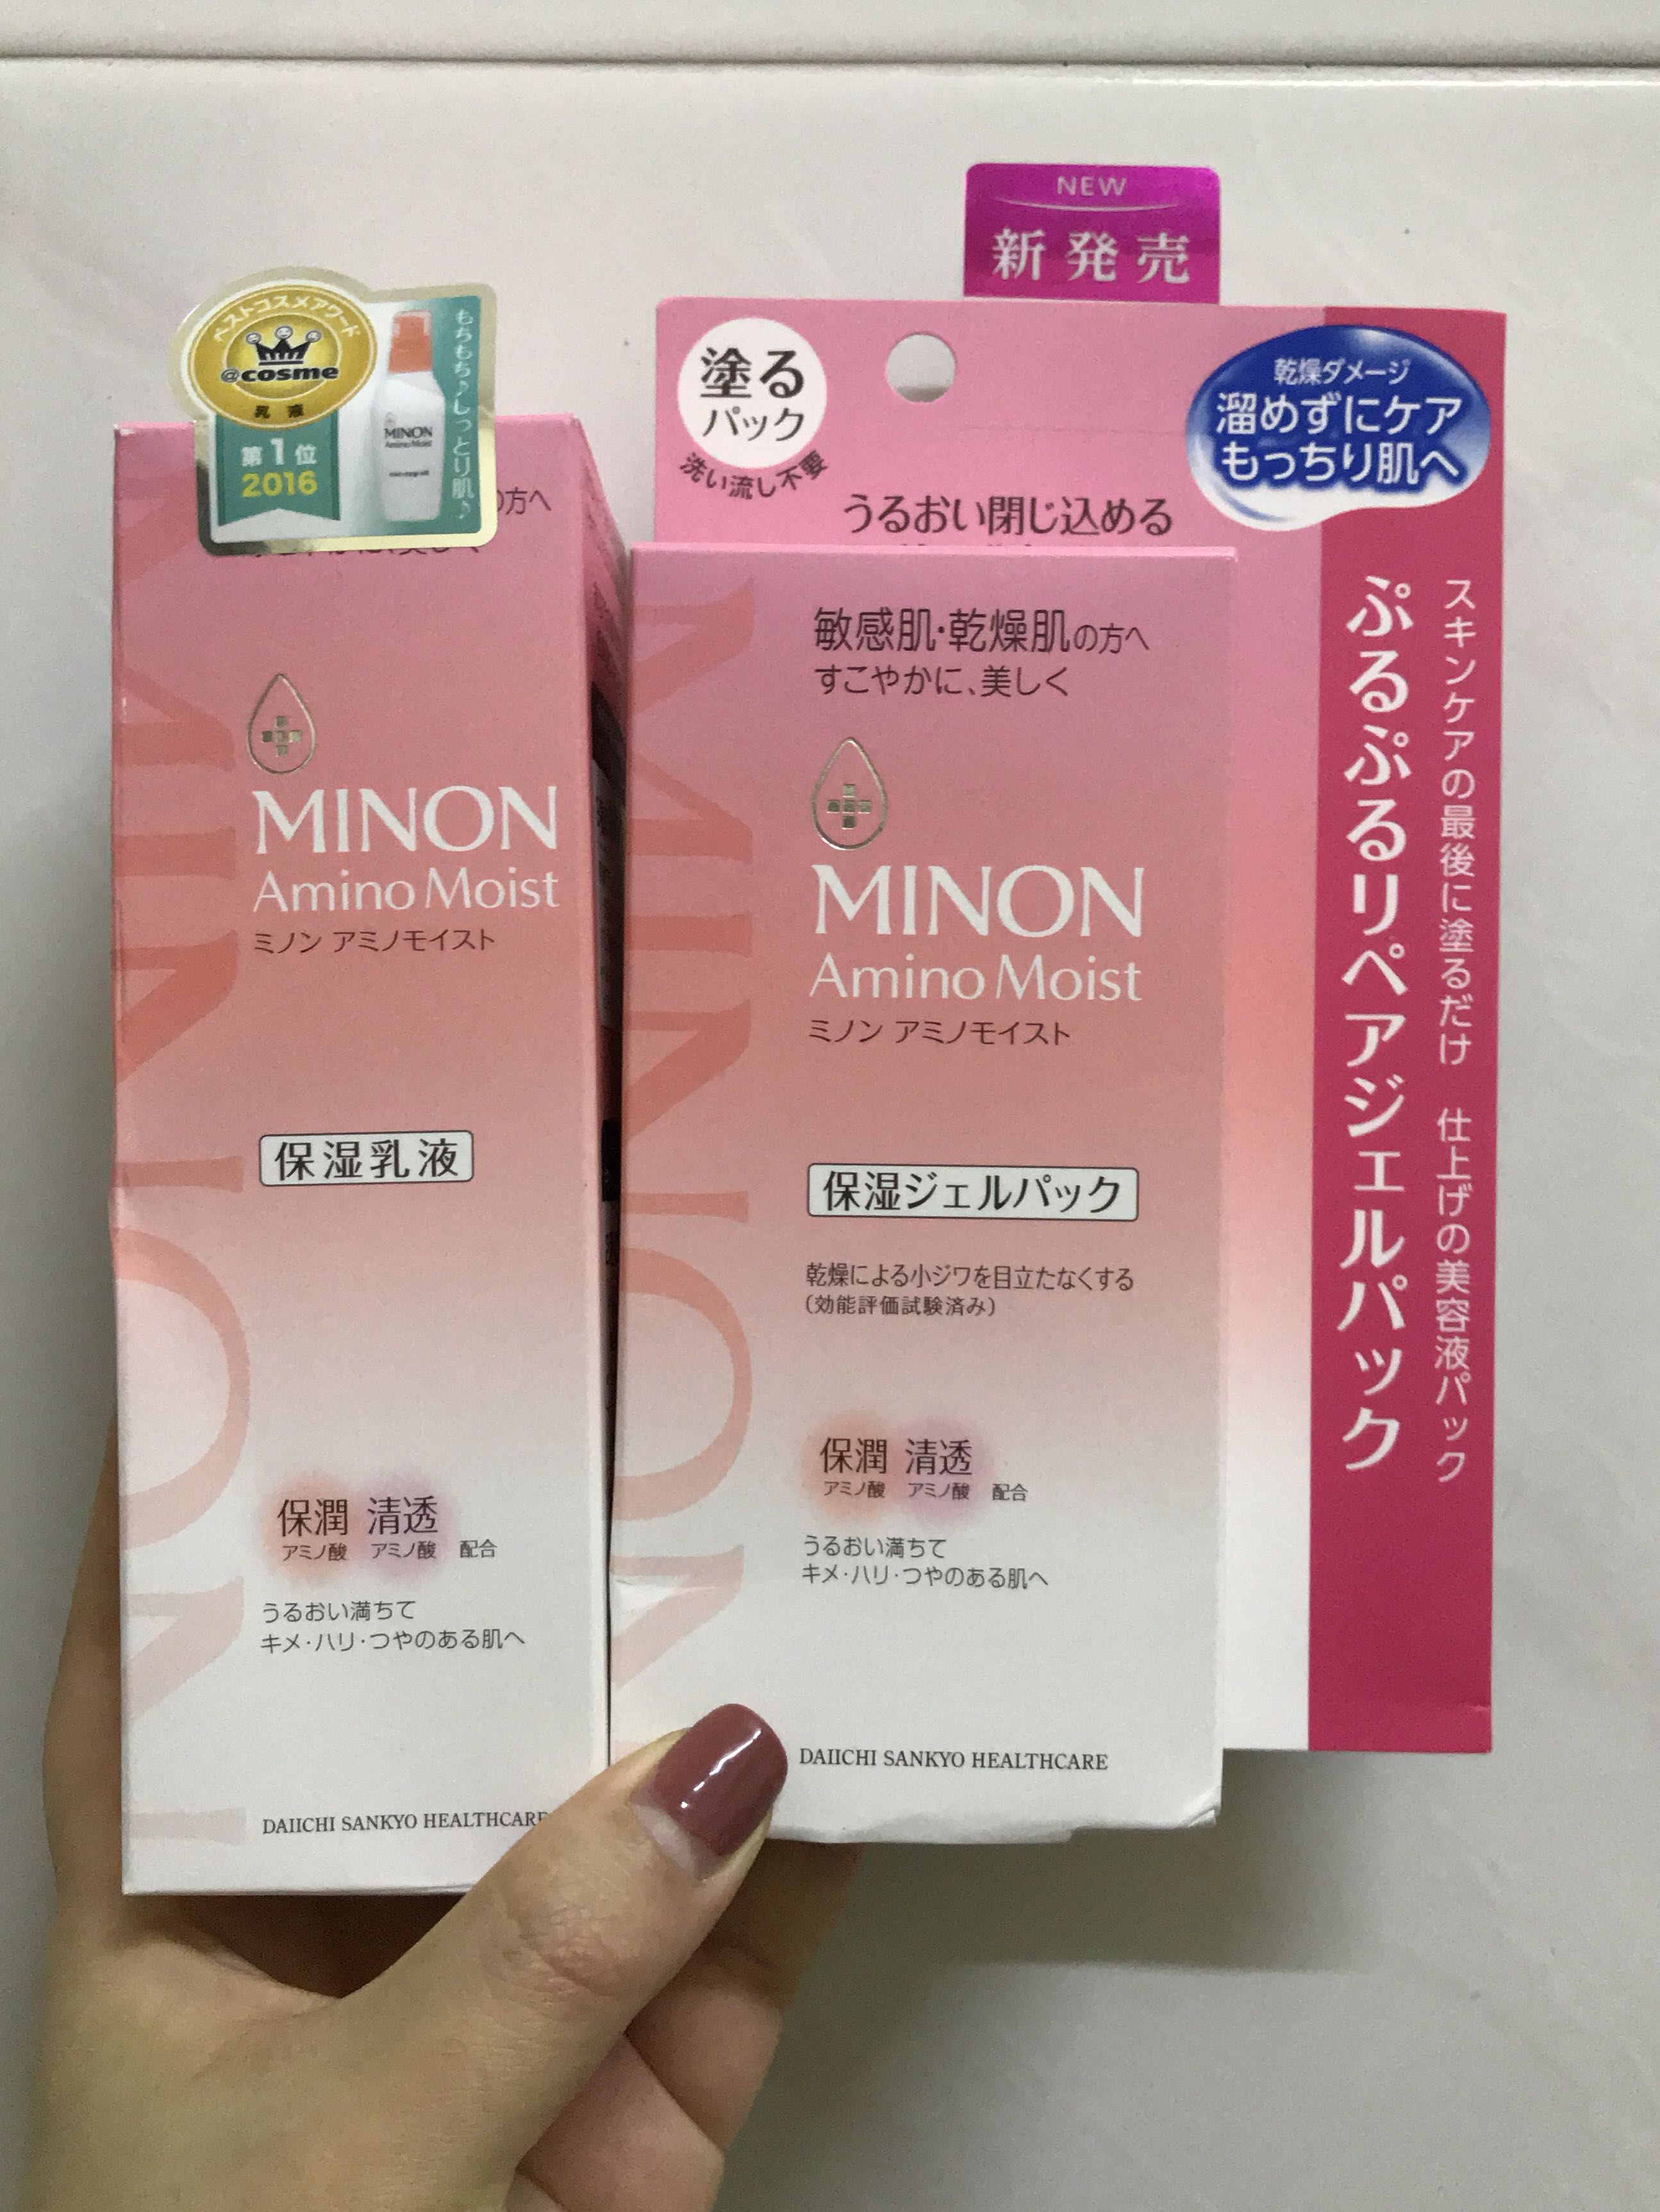 Minon Japan lotion and mask set